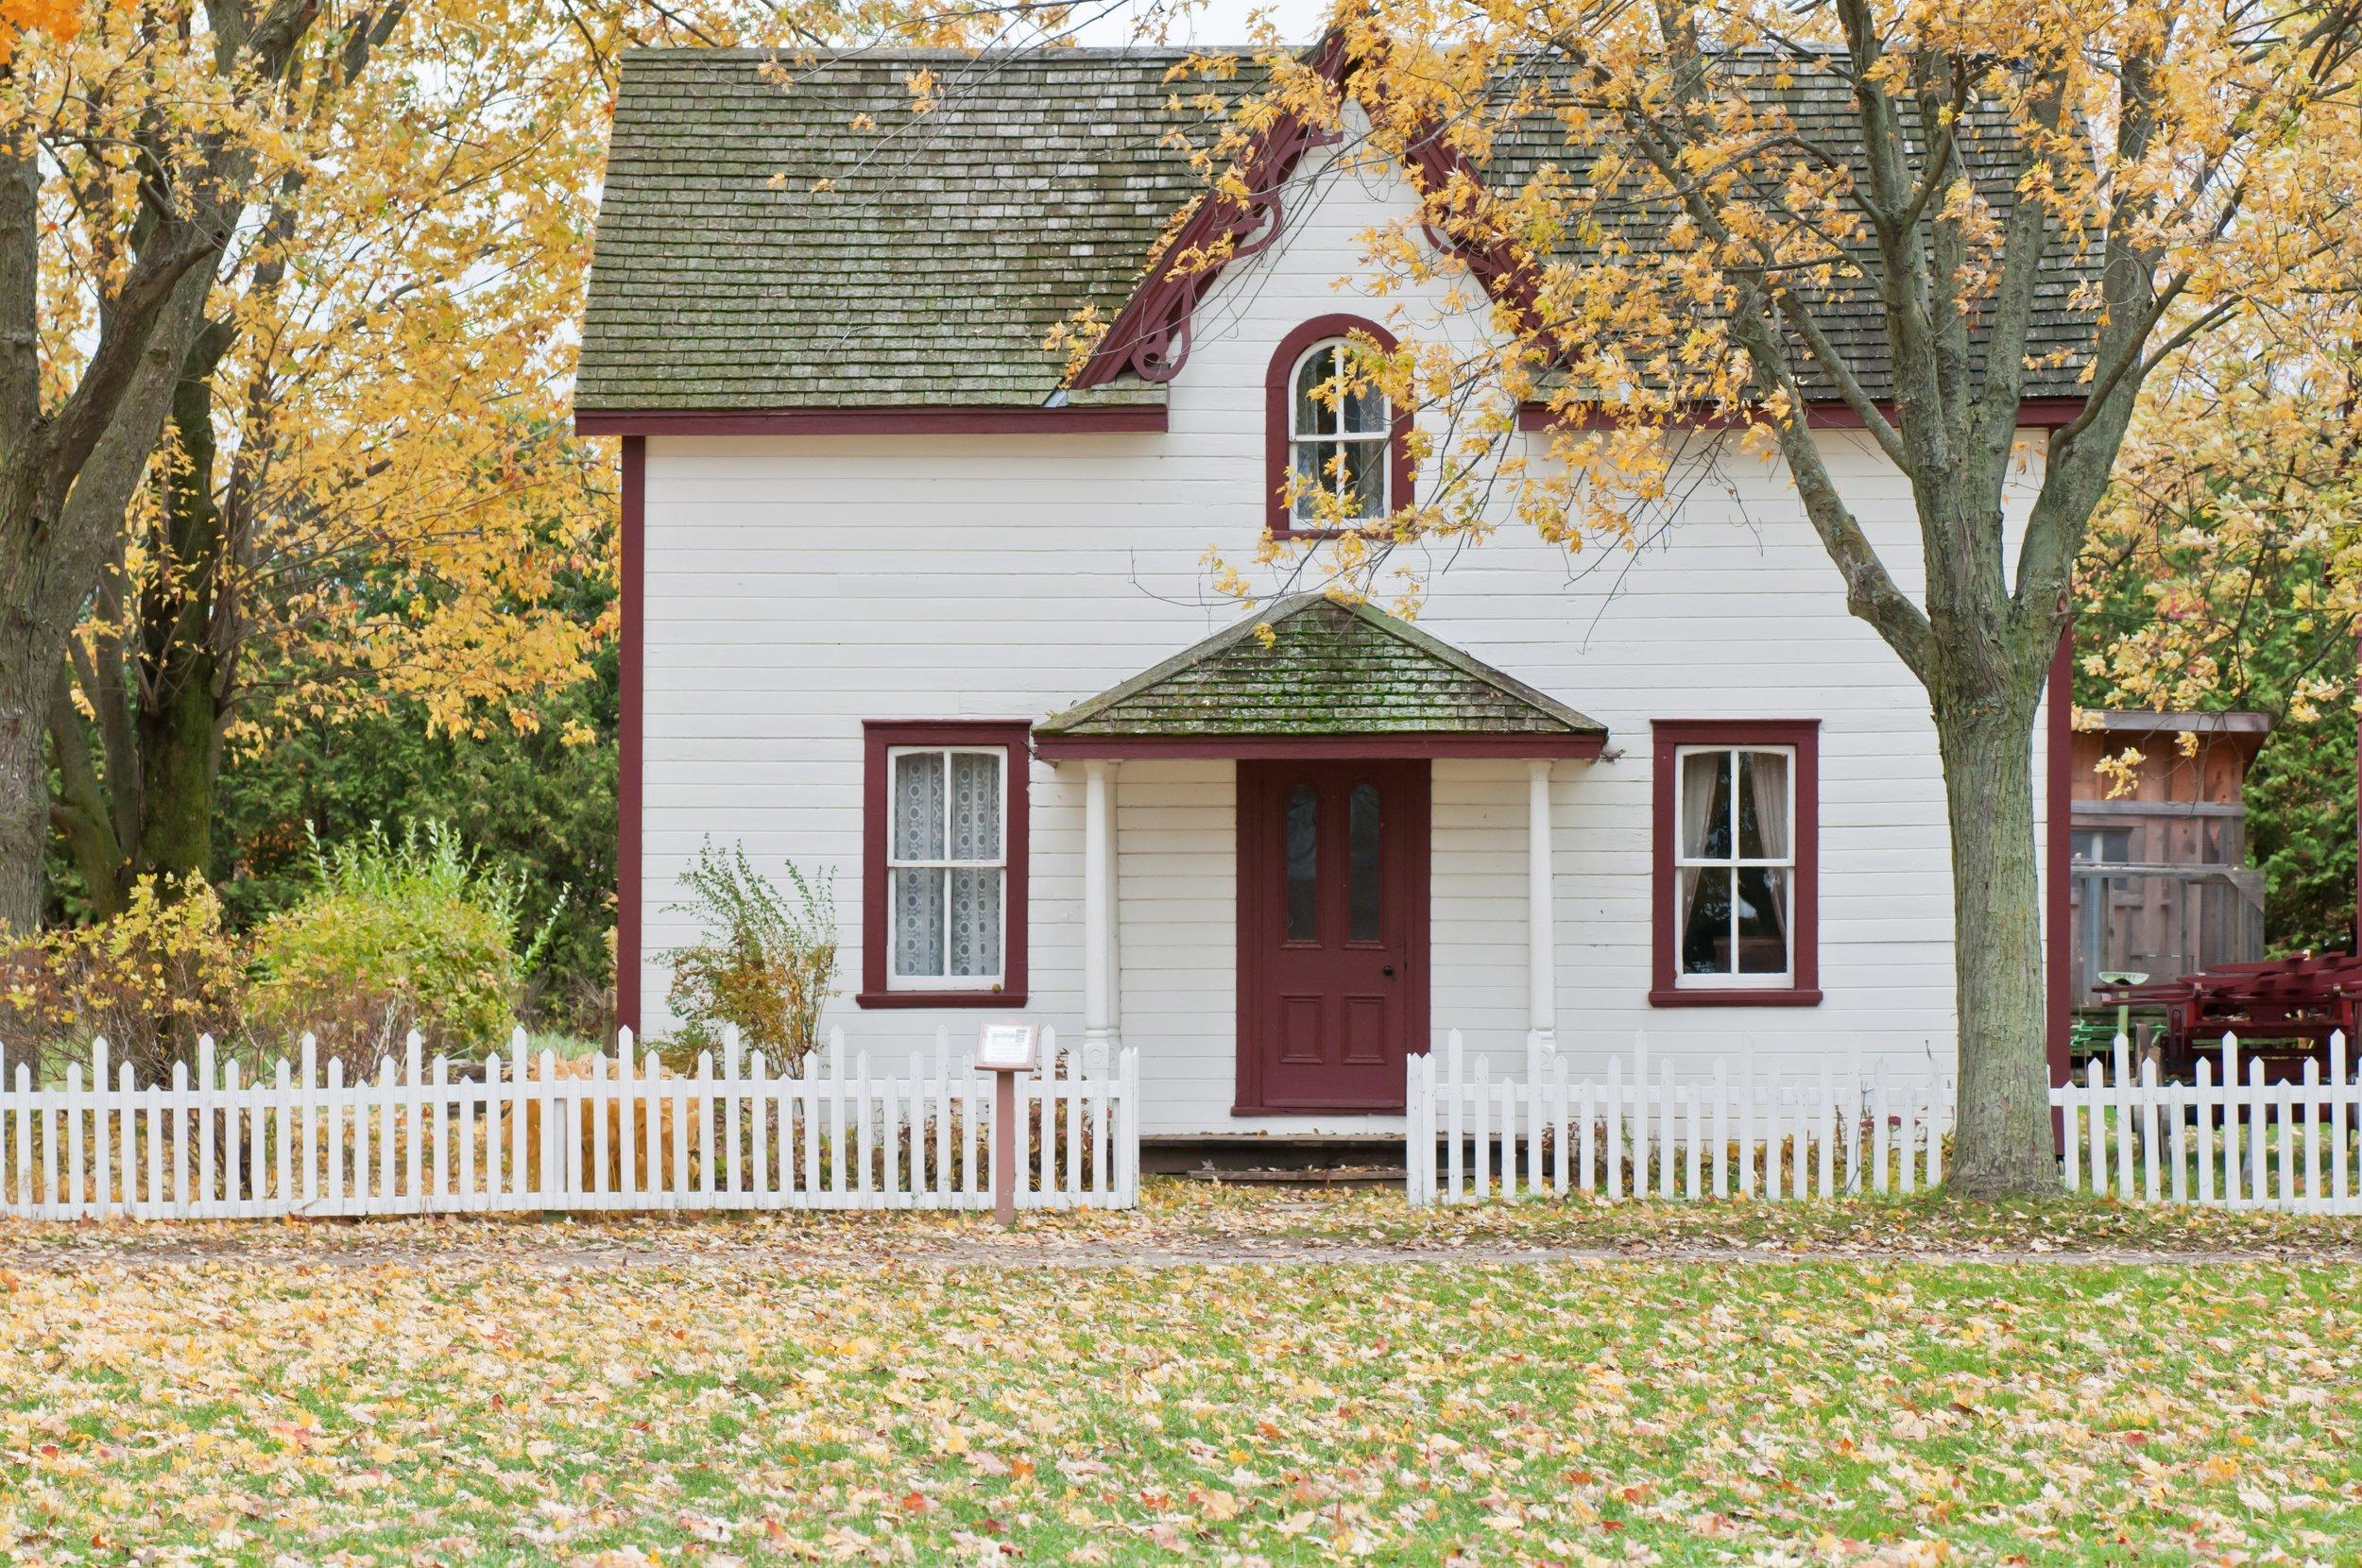 siding-house-contractors-Maple-Grove.jpg